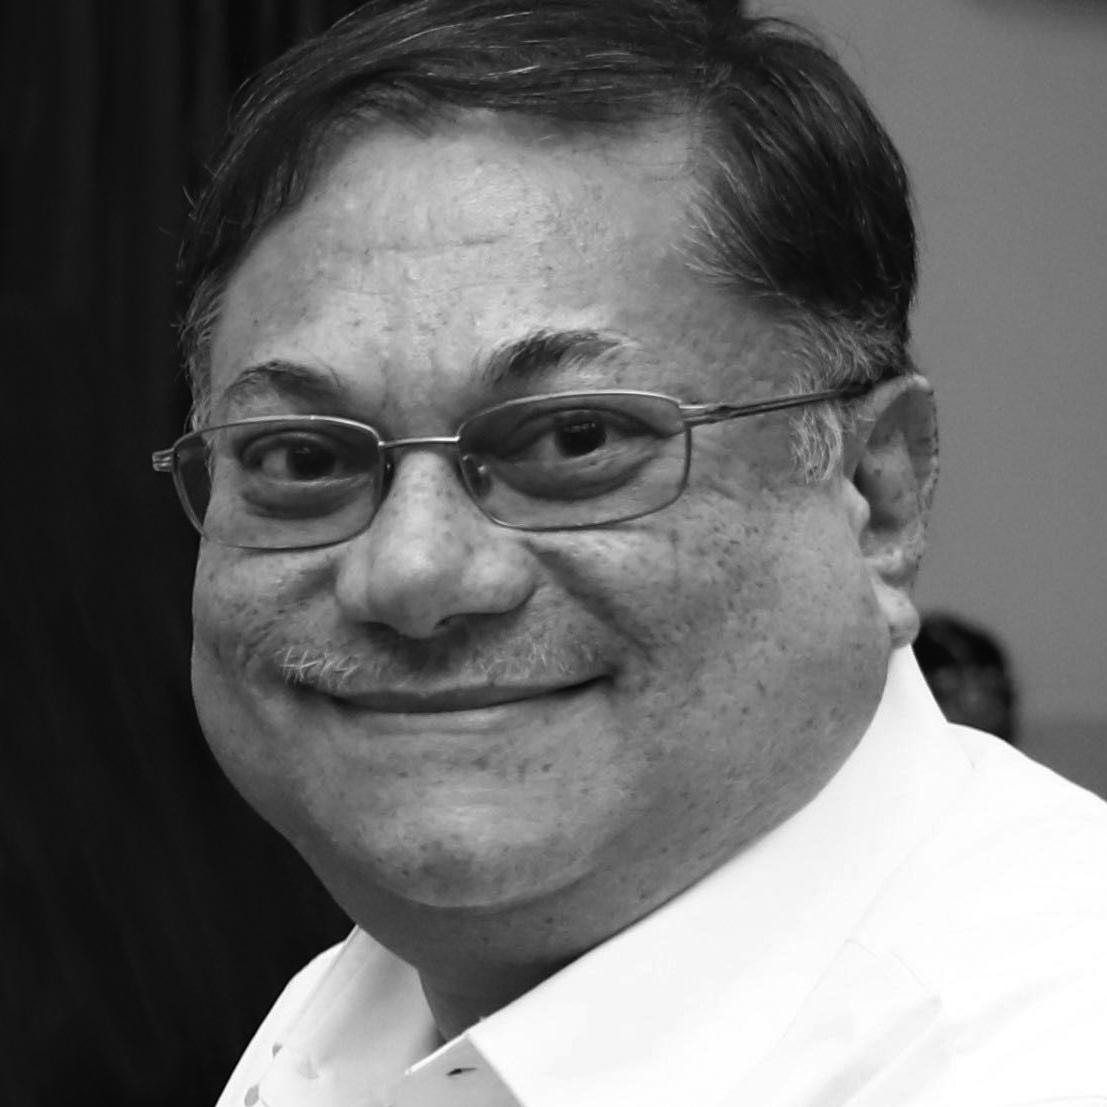 HITLAB Summit Prof Supten Sarbadhikari